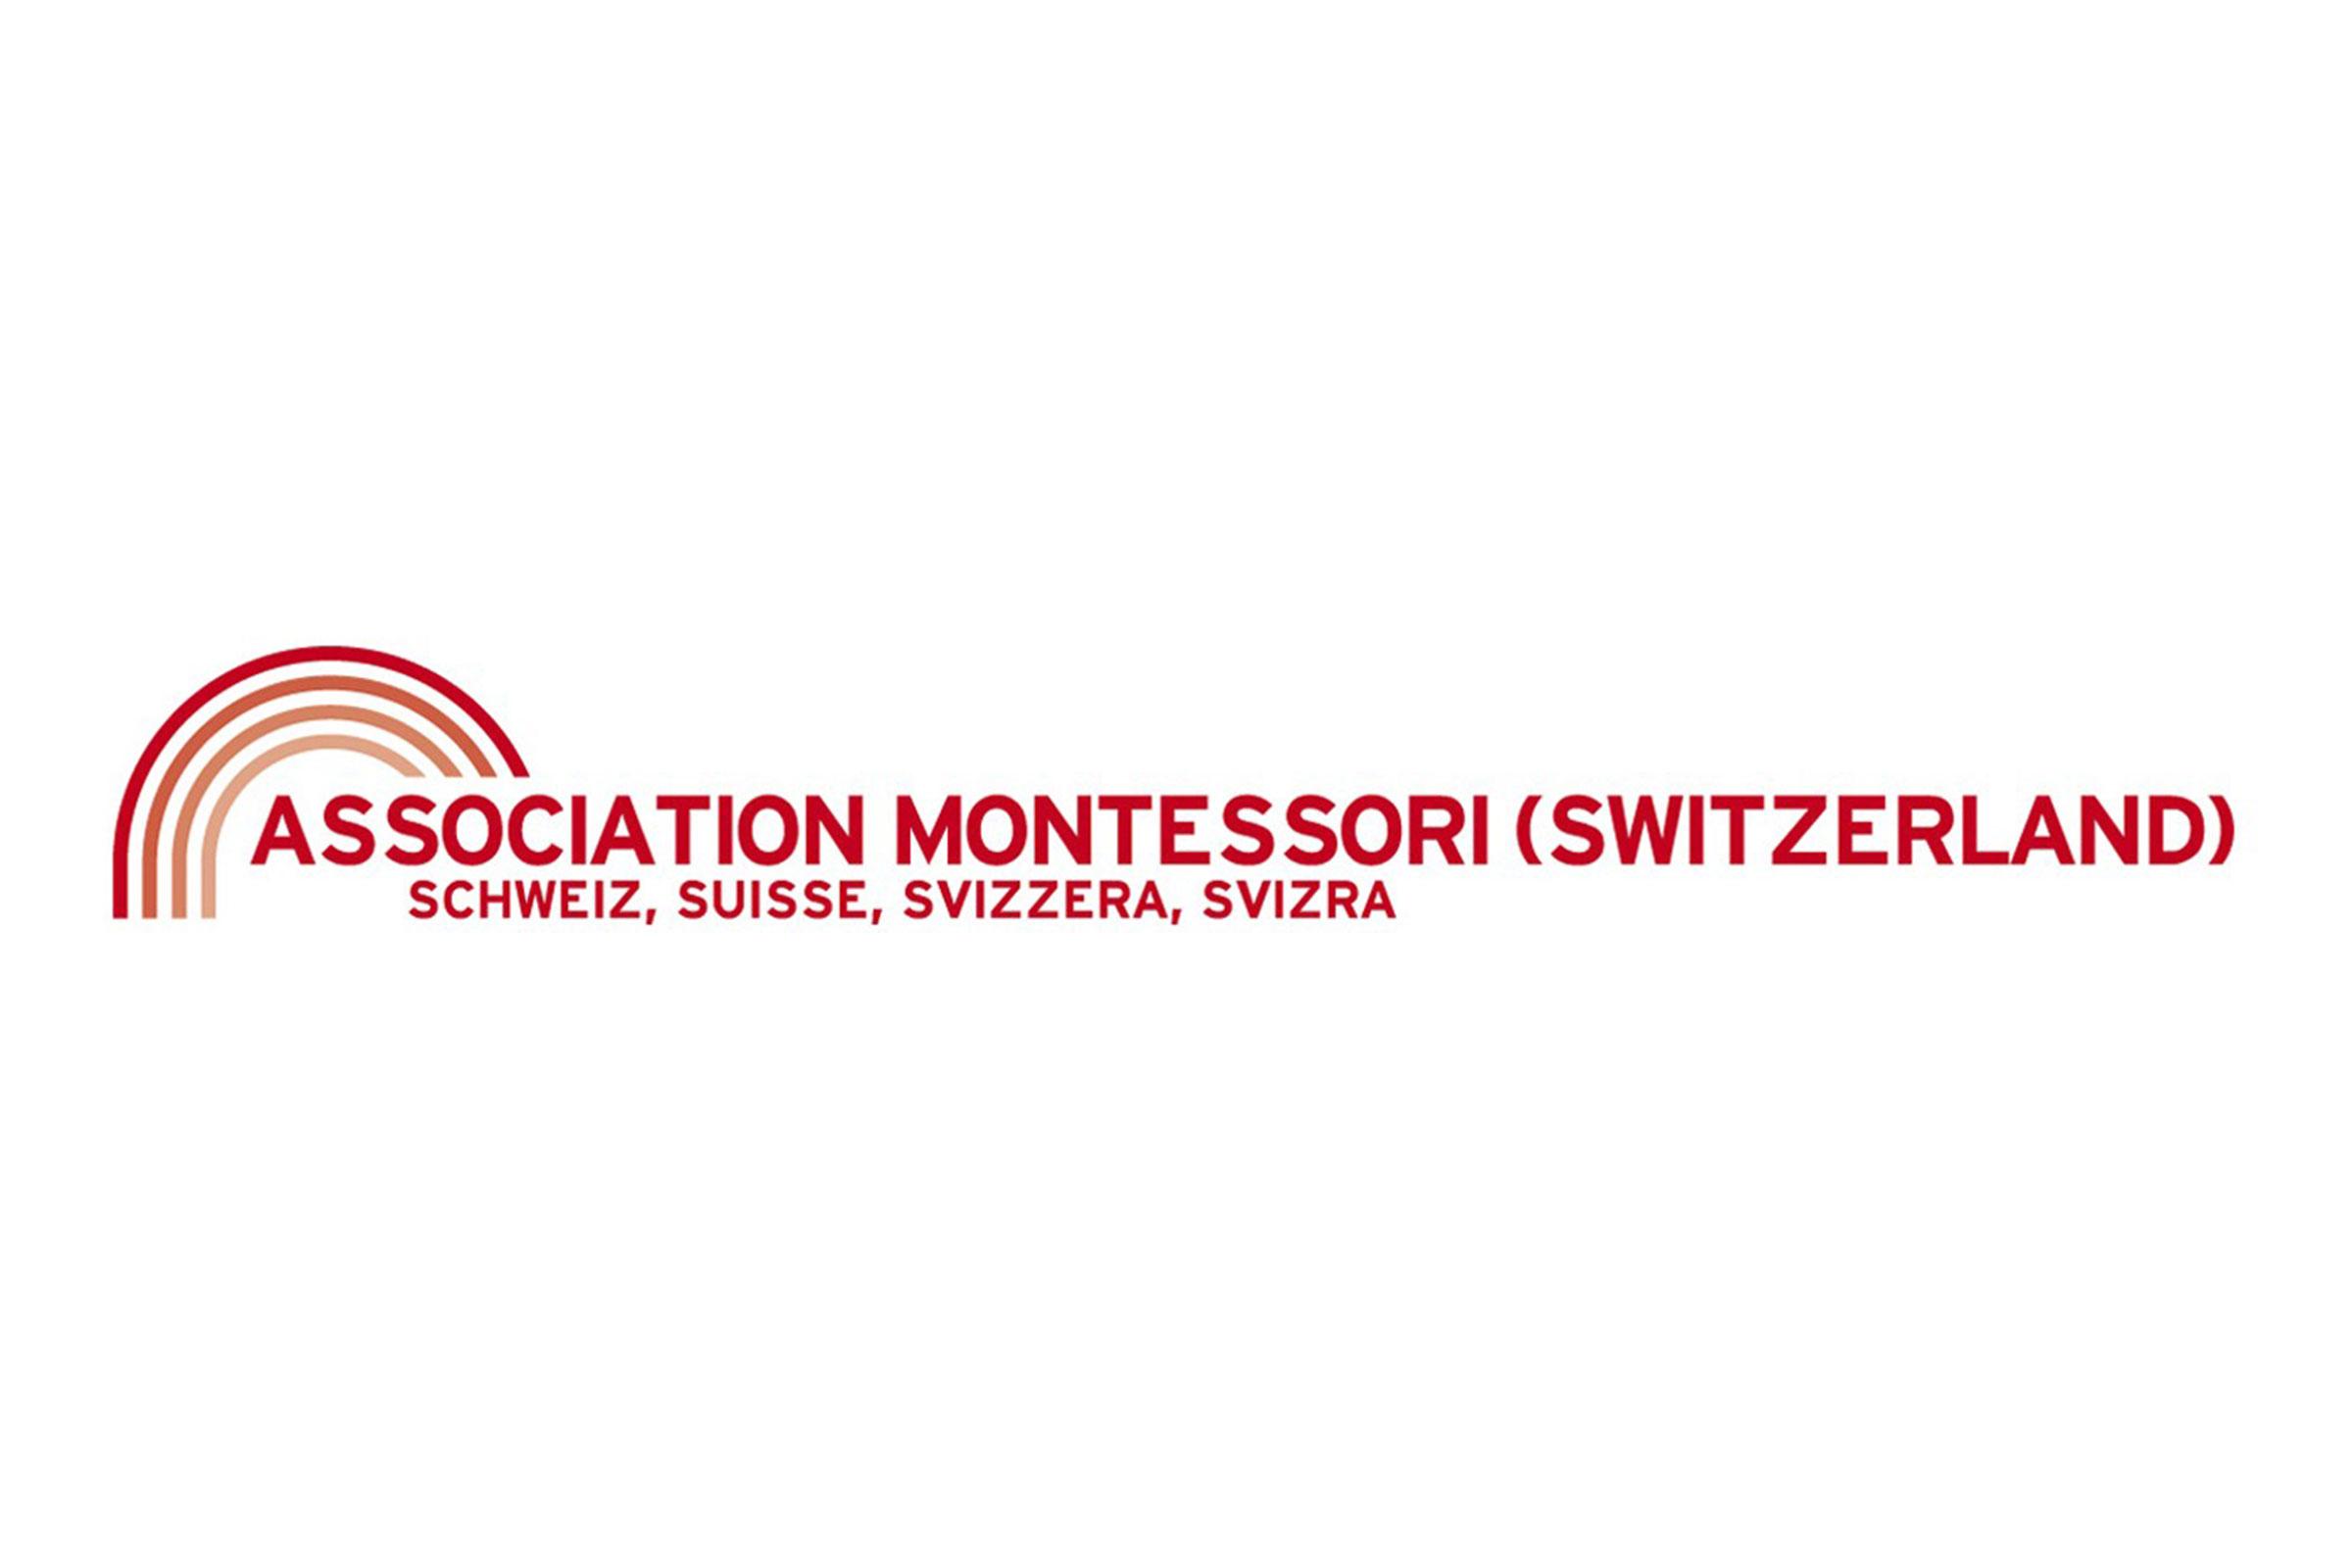 Association Montessori Switzerland logo